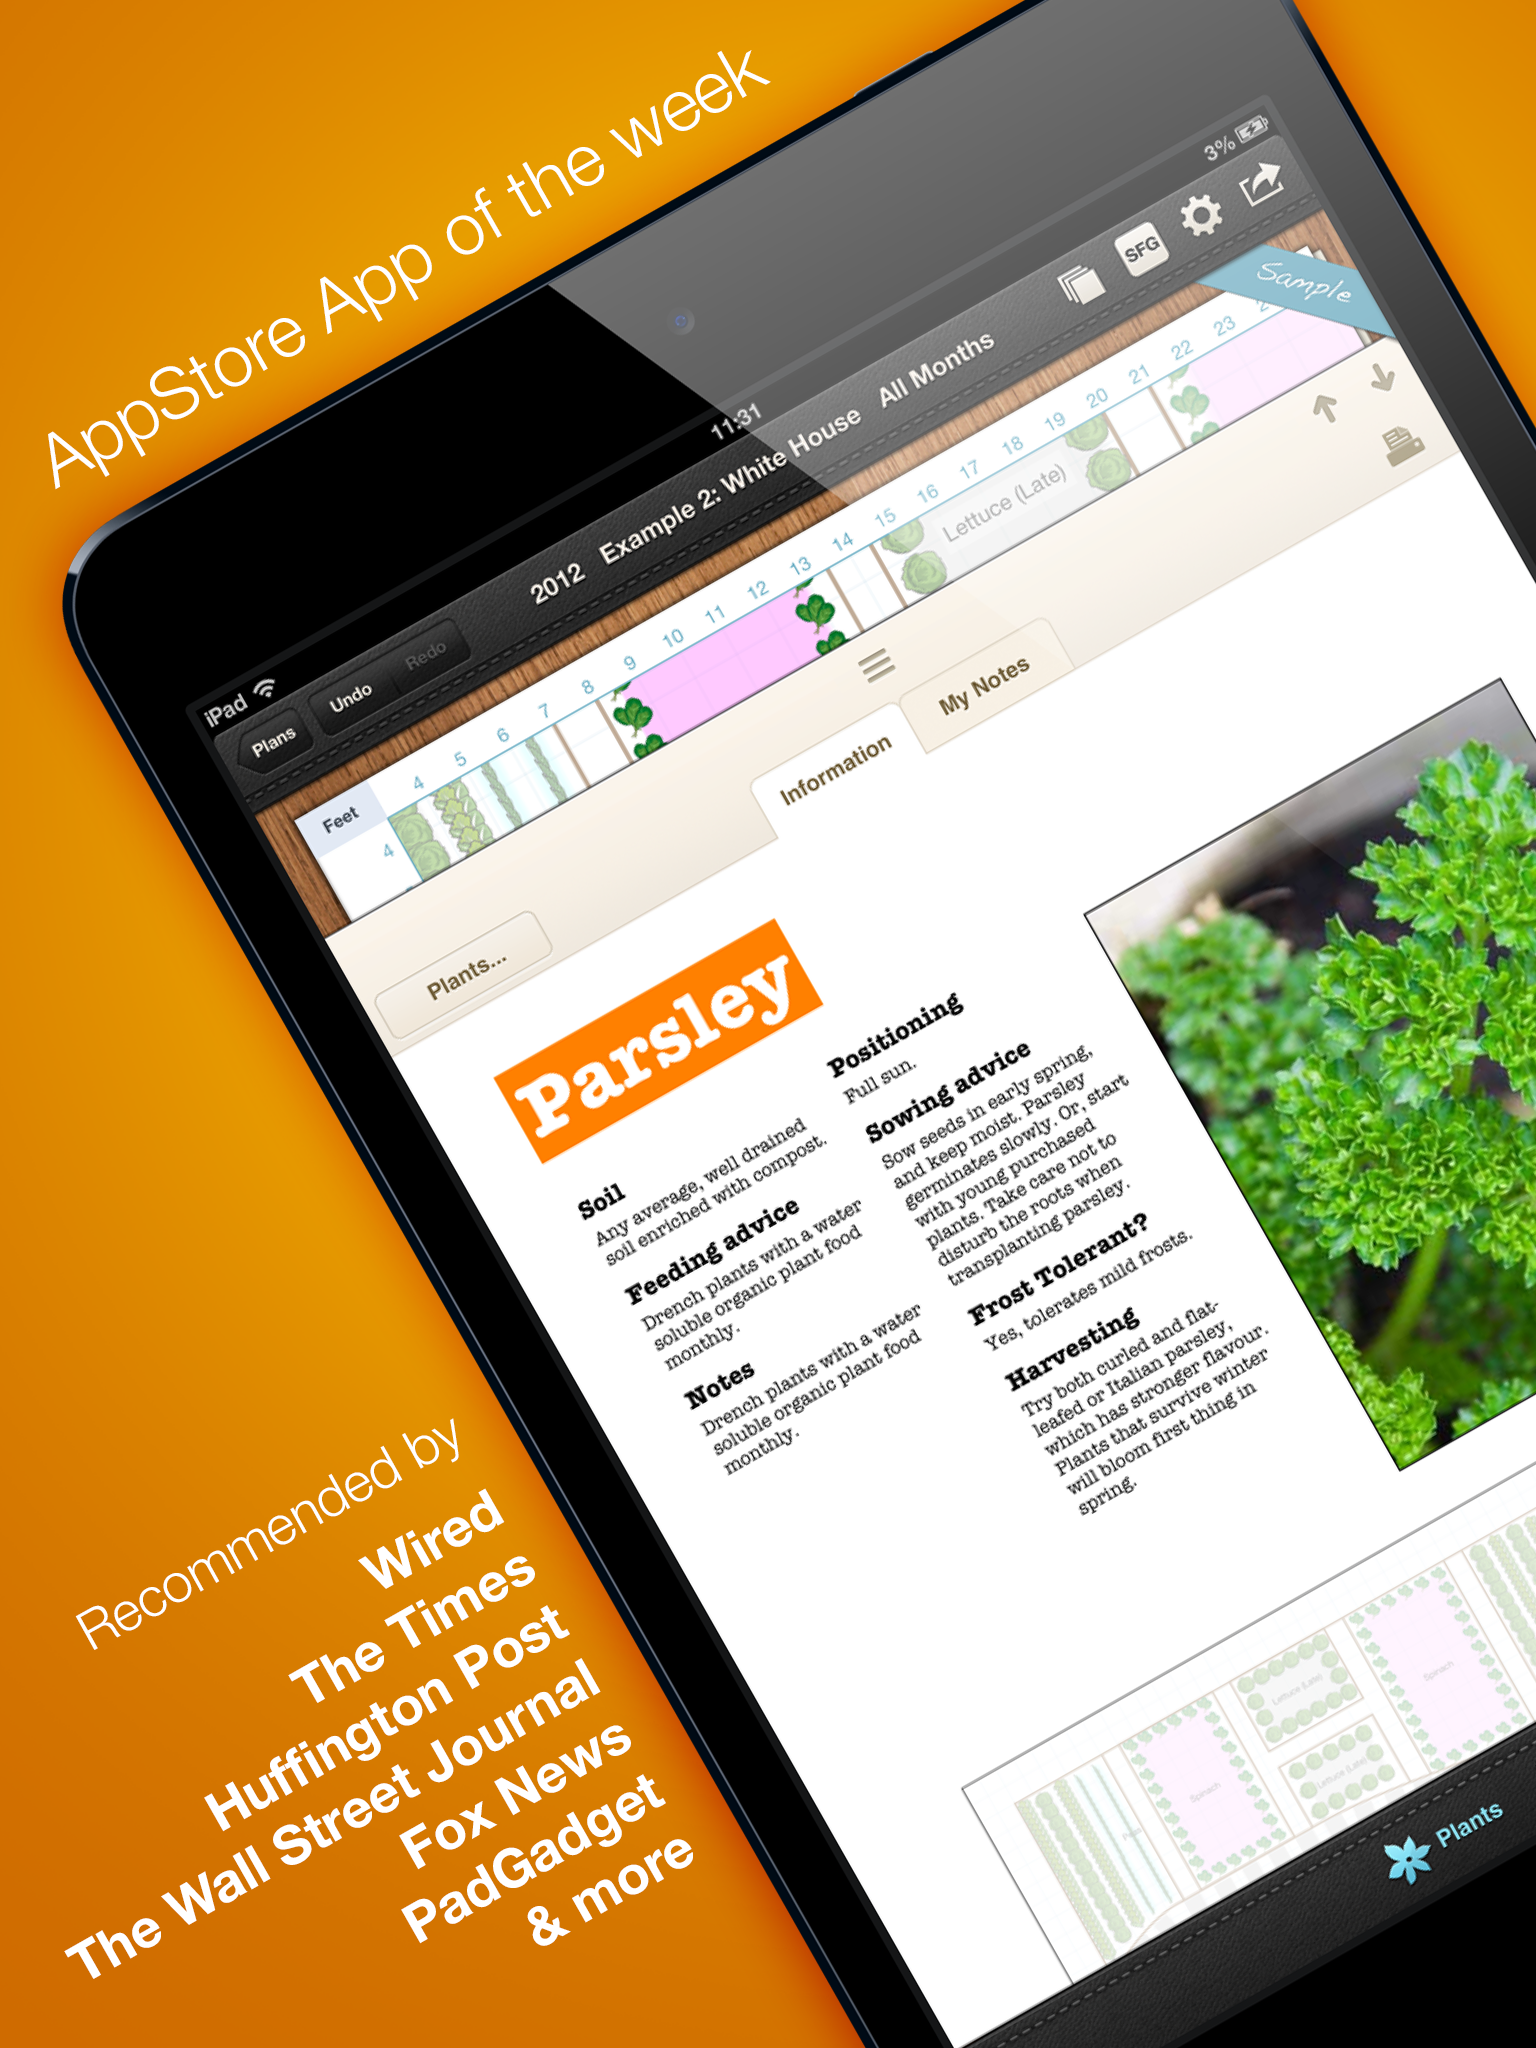 app of the week gardening pinterest app gardens and garden